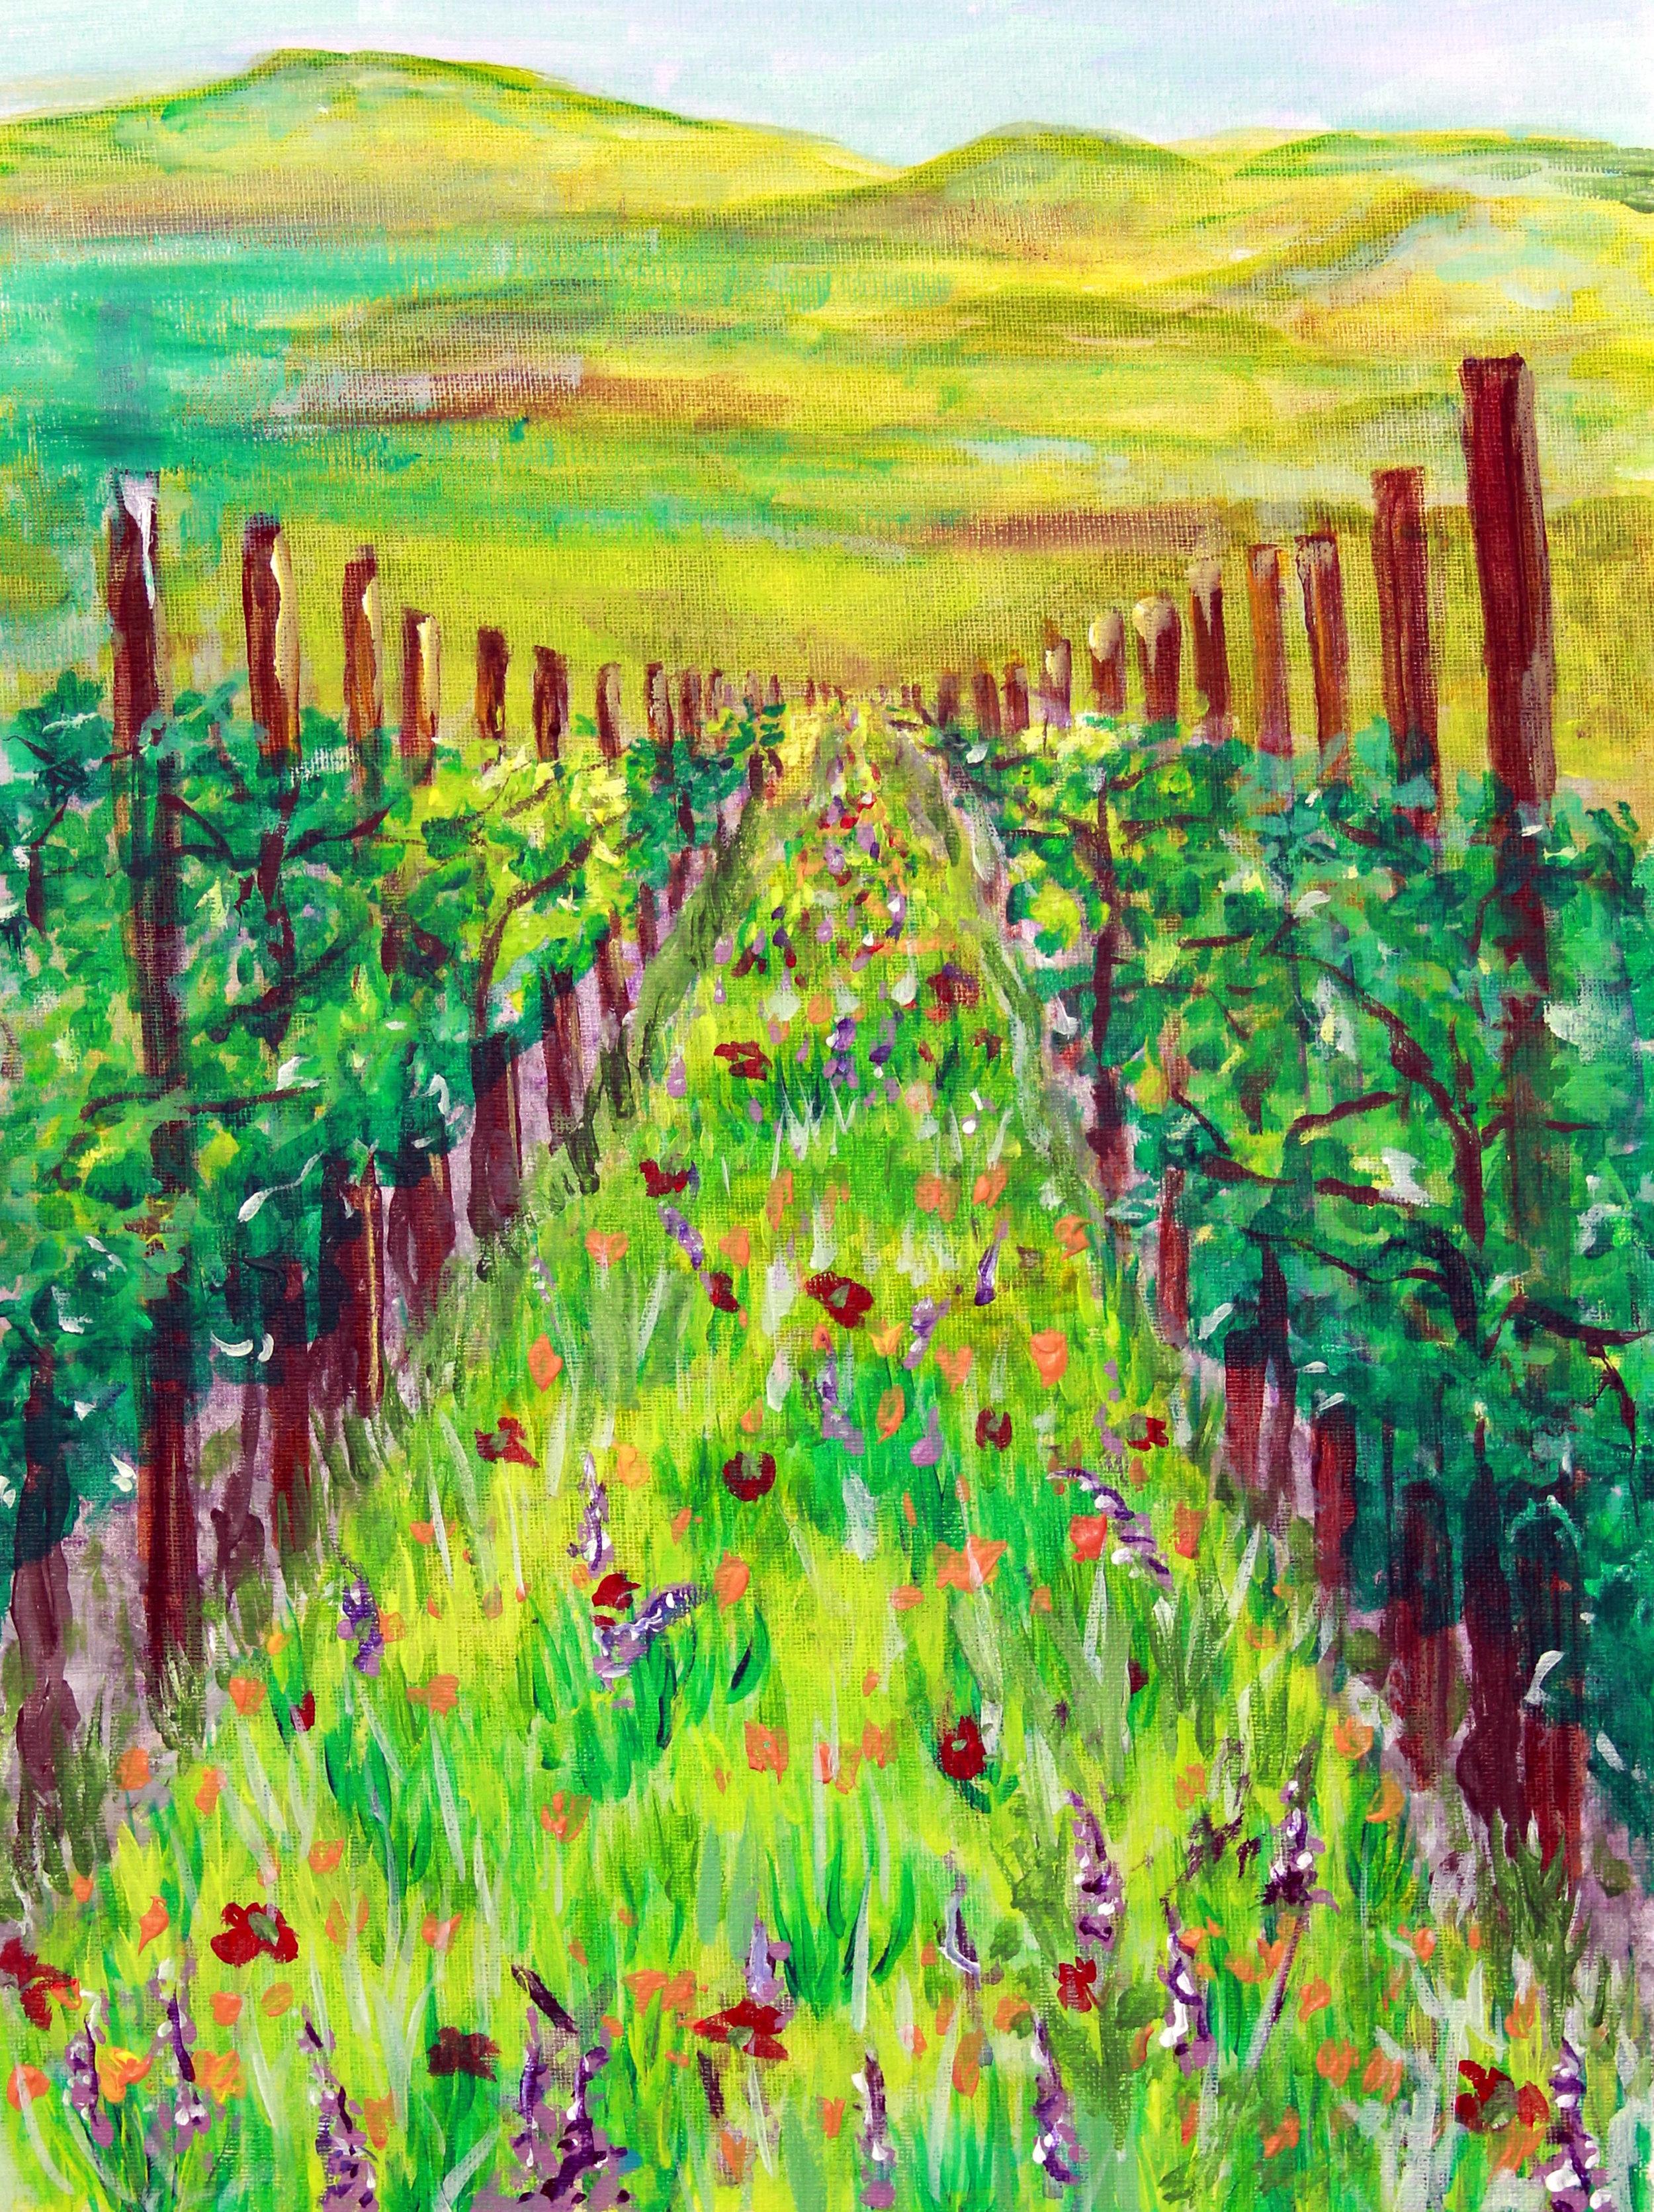 4) Orchard